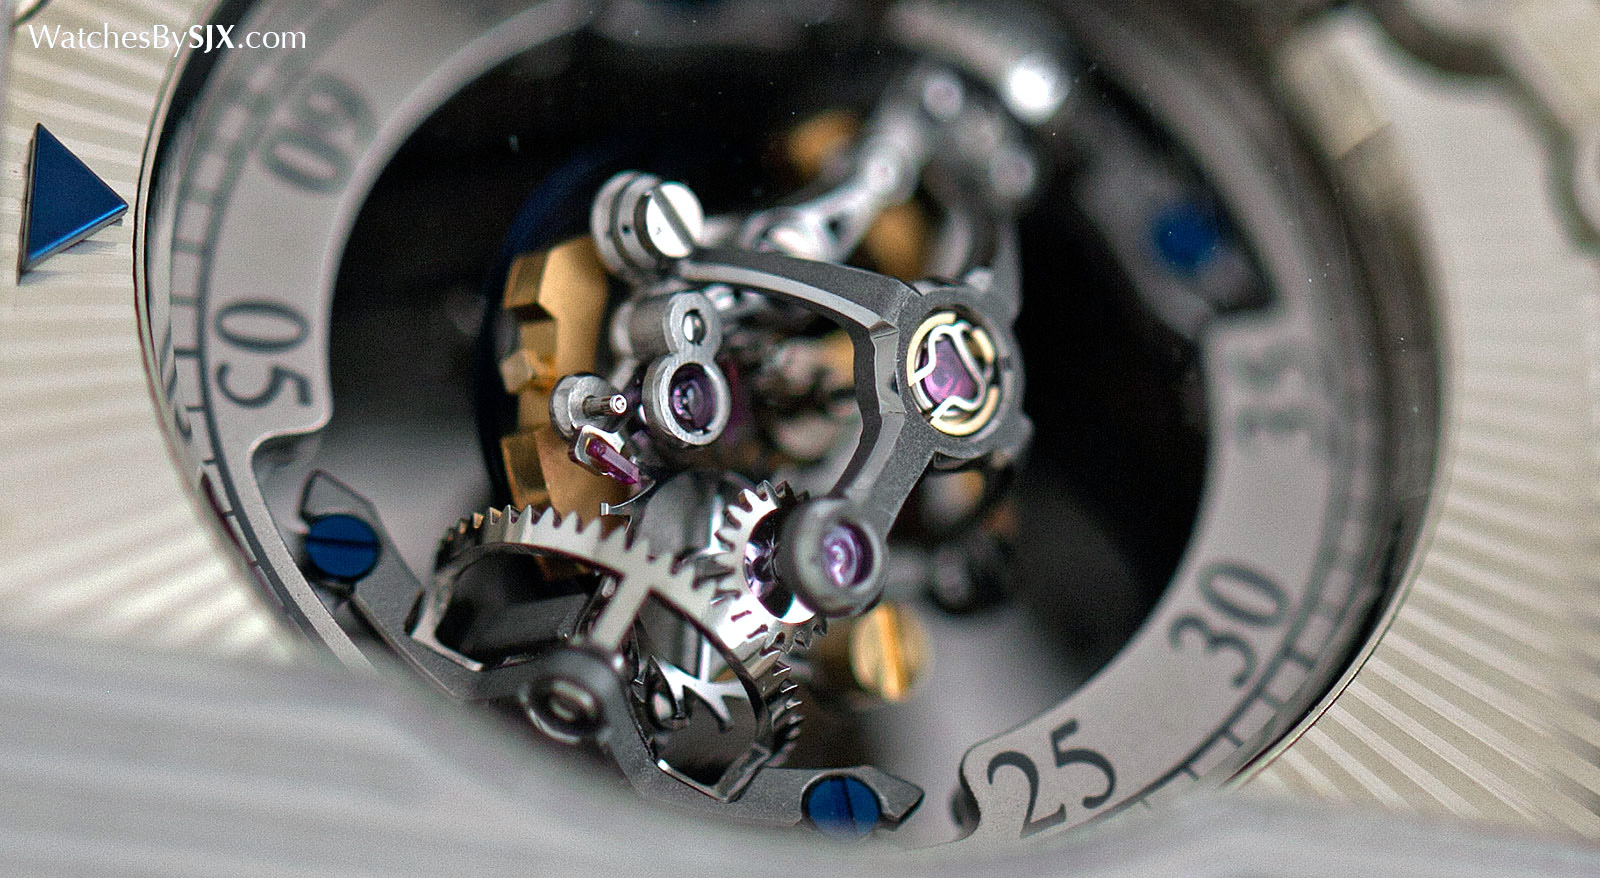 Jaeger-LeCoultre Reverso Tribute Gyrotourbillon platinum 14